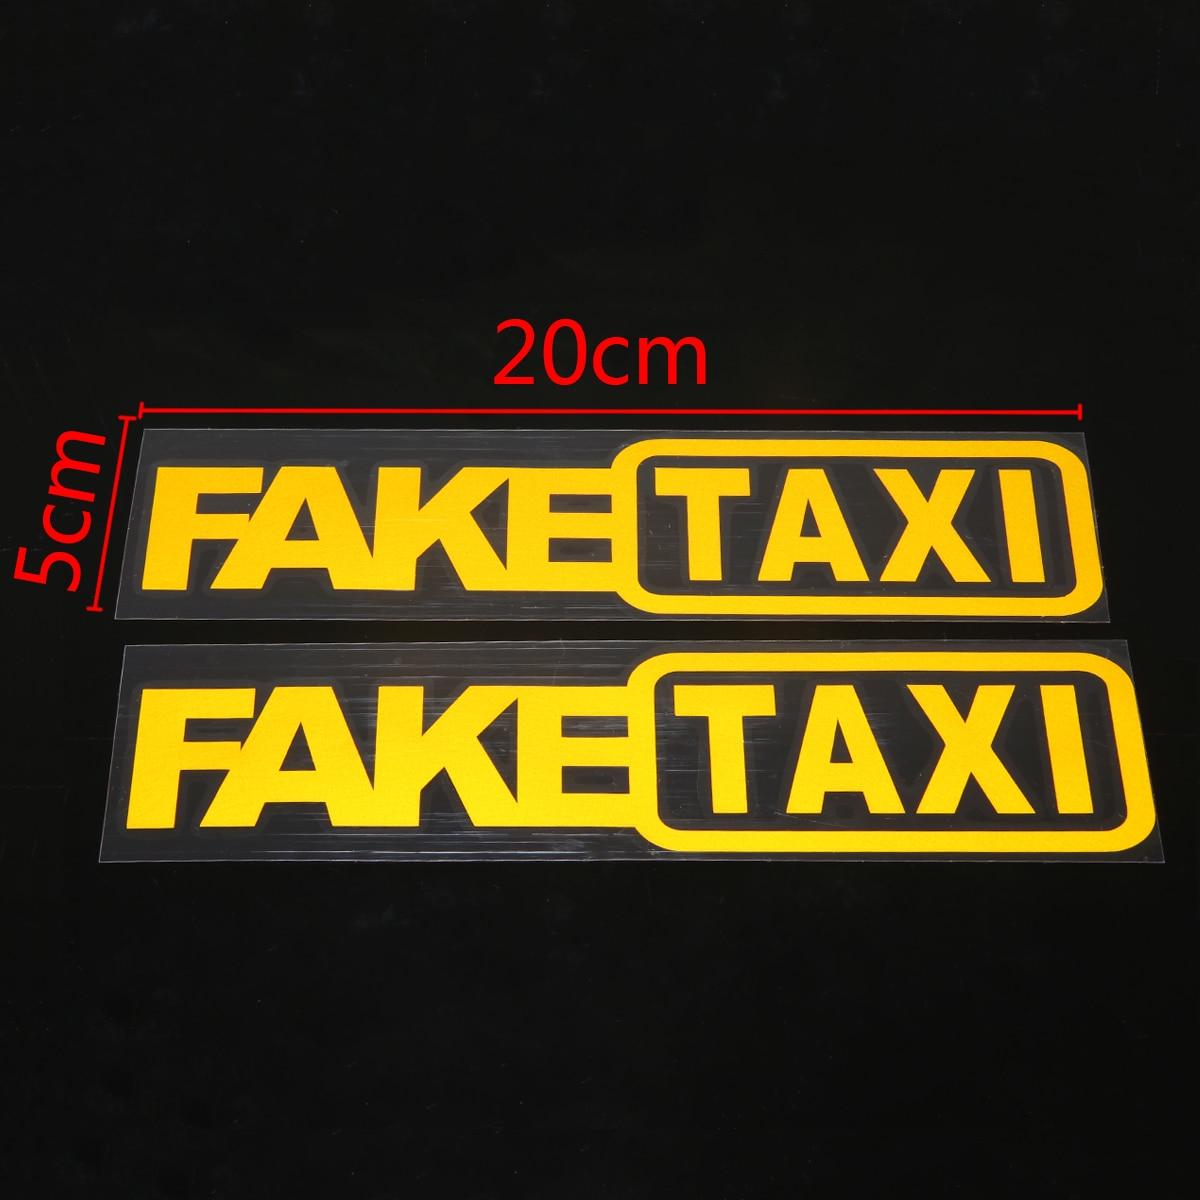 2pcs FAKE TAXI Sticker Car Styling Car Bike Motorcycle Helmet Decal Emblem Self Adhesive Vinyl Stickers in Car Stickers from Automobiles Motorcycles